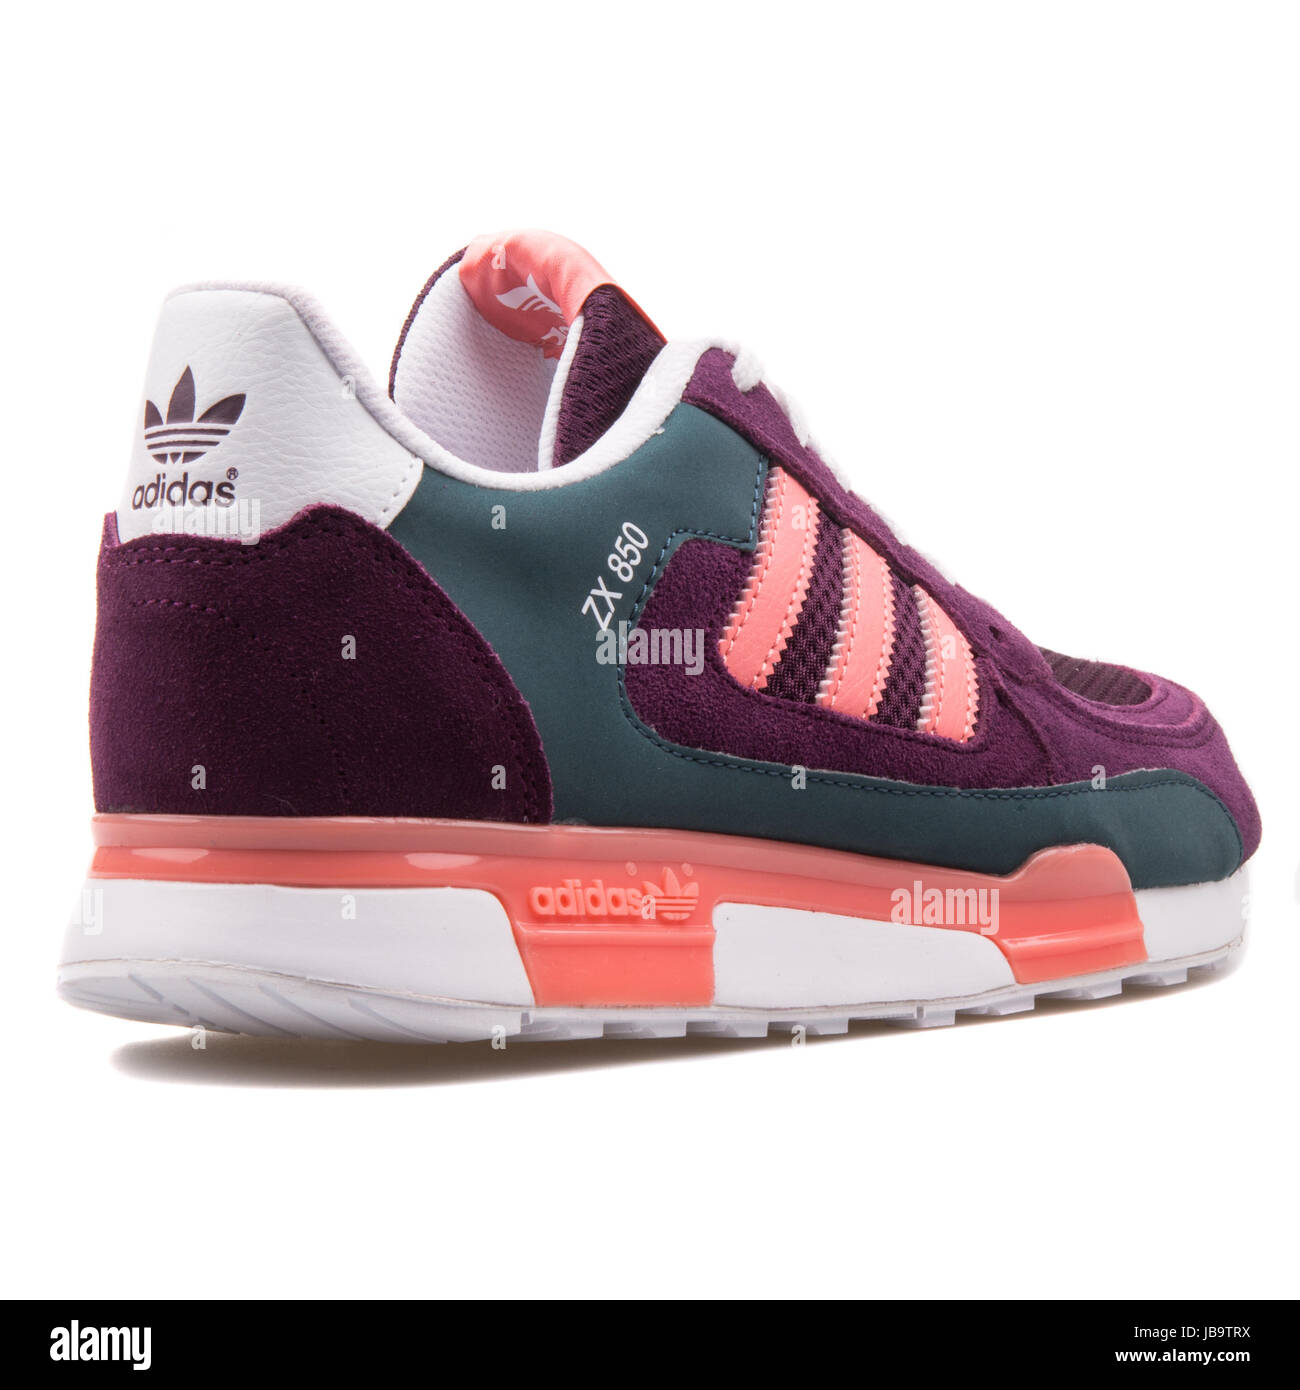 53e02944 purchase adidas zx 850 rosado 53b59 5c087